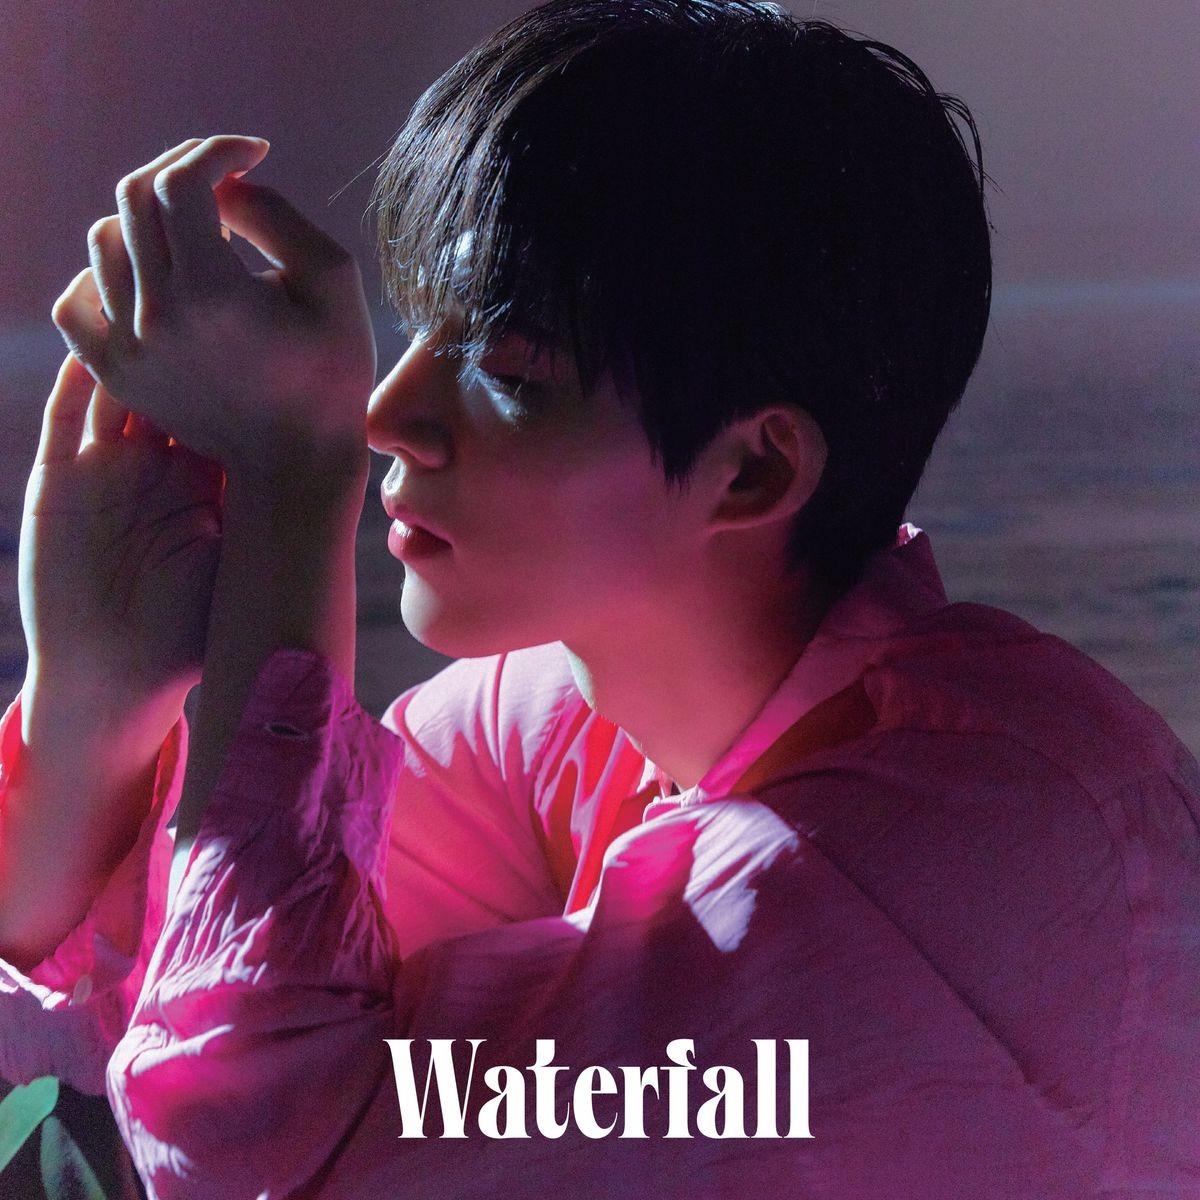 [Album] B.I (비아이) – WATERFALL [FLAC + MP3 320 / WEB] [2021.06.01]